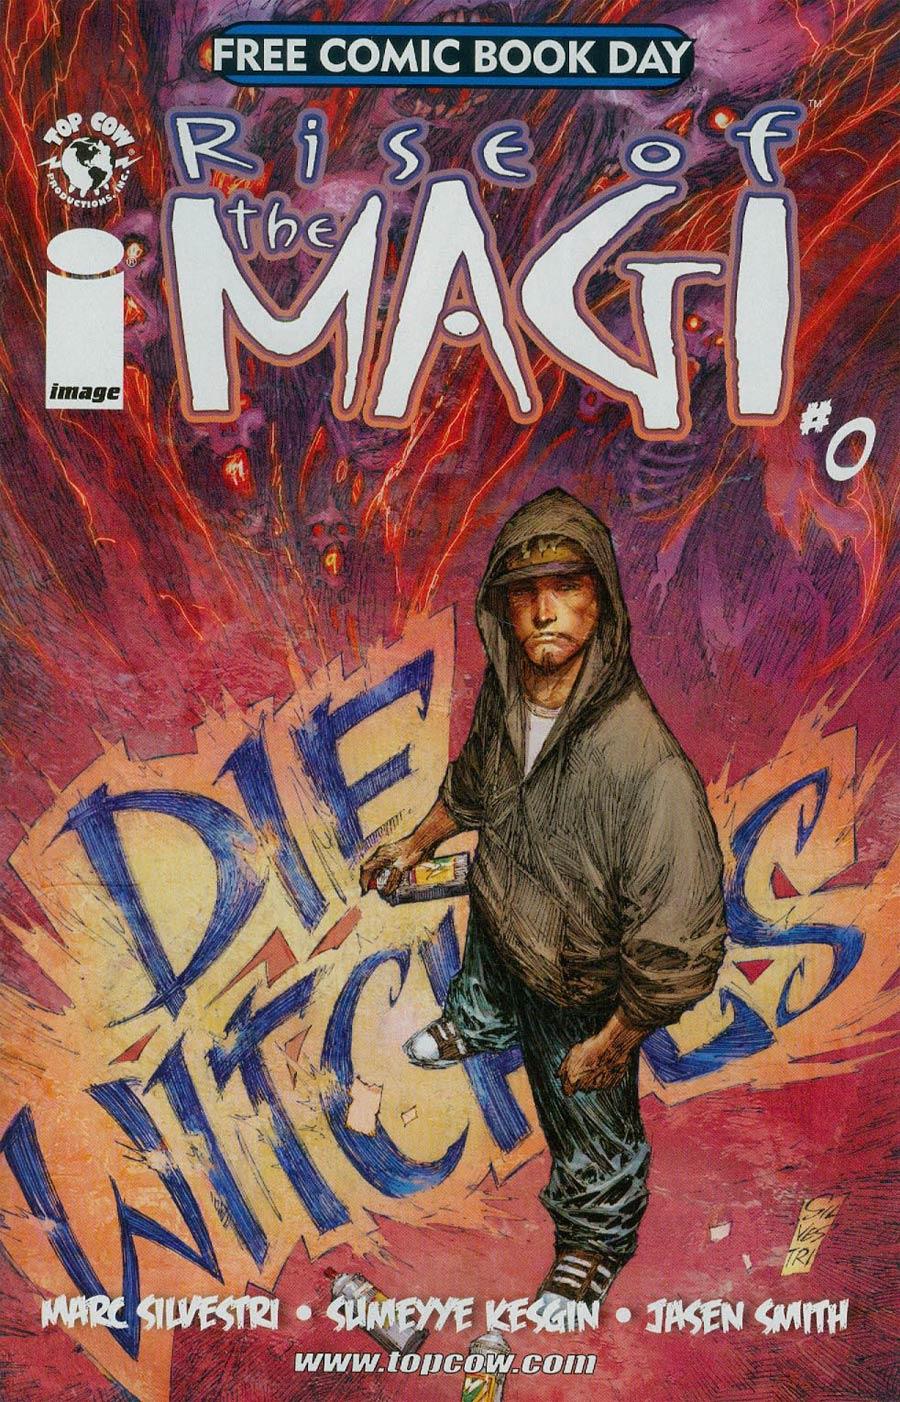 FCBD 2014 Rise Of The Magi #0